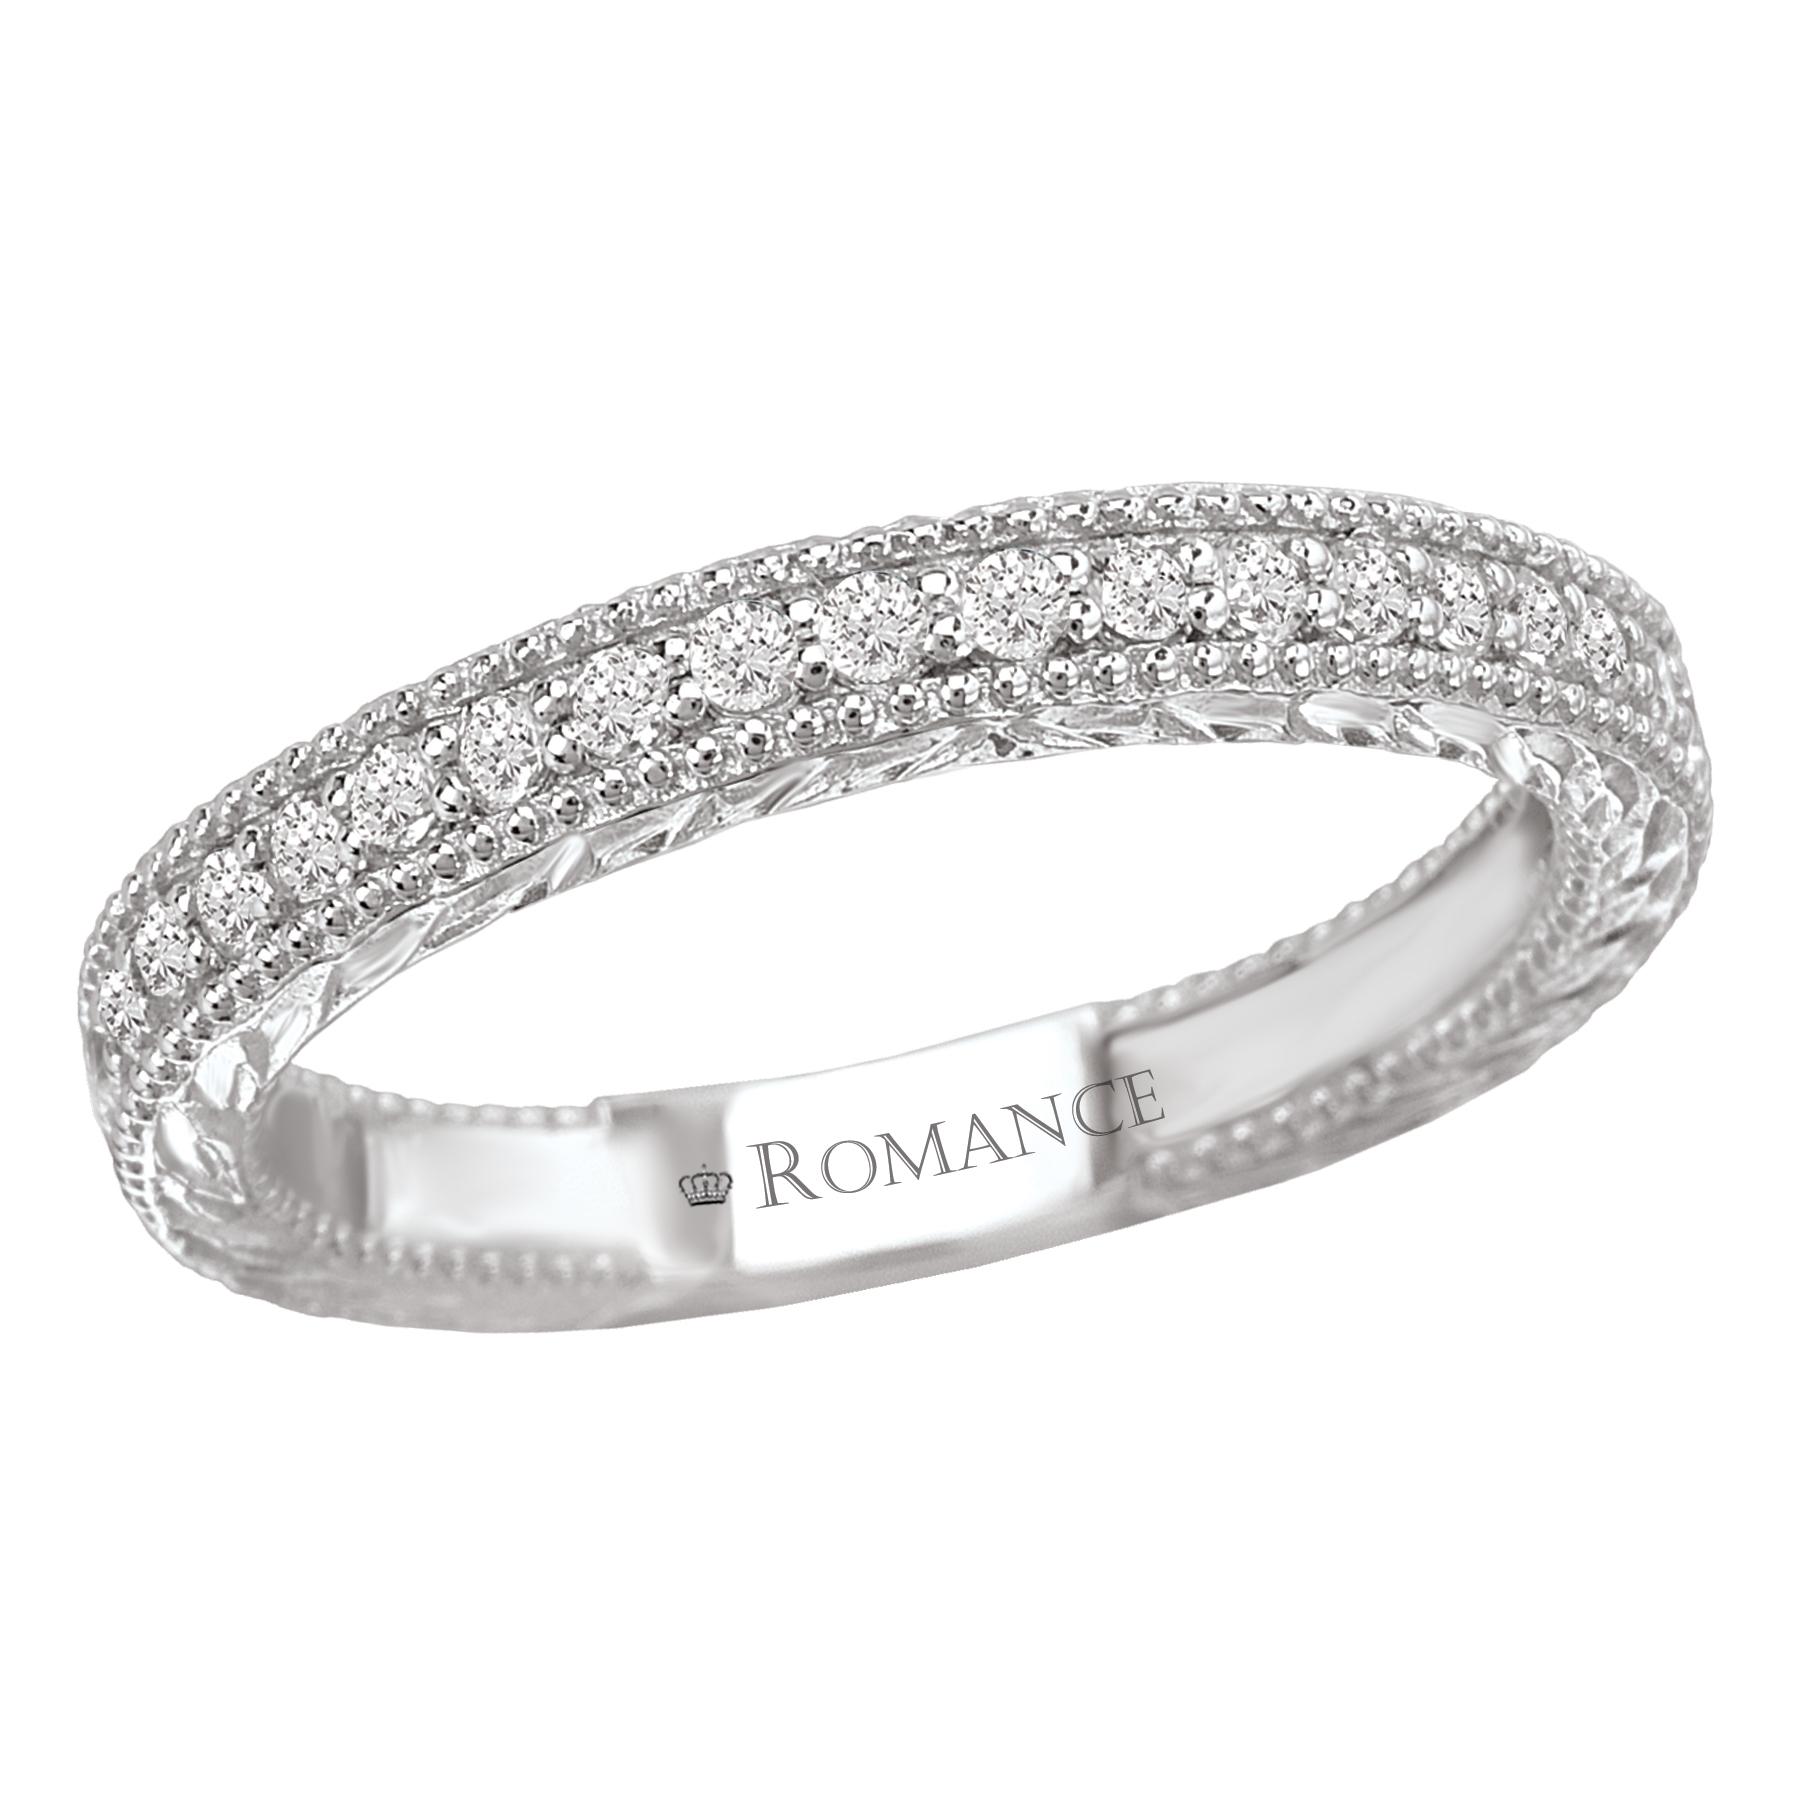 Romance Wedding Bands 117385-W product image